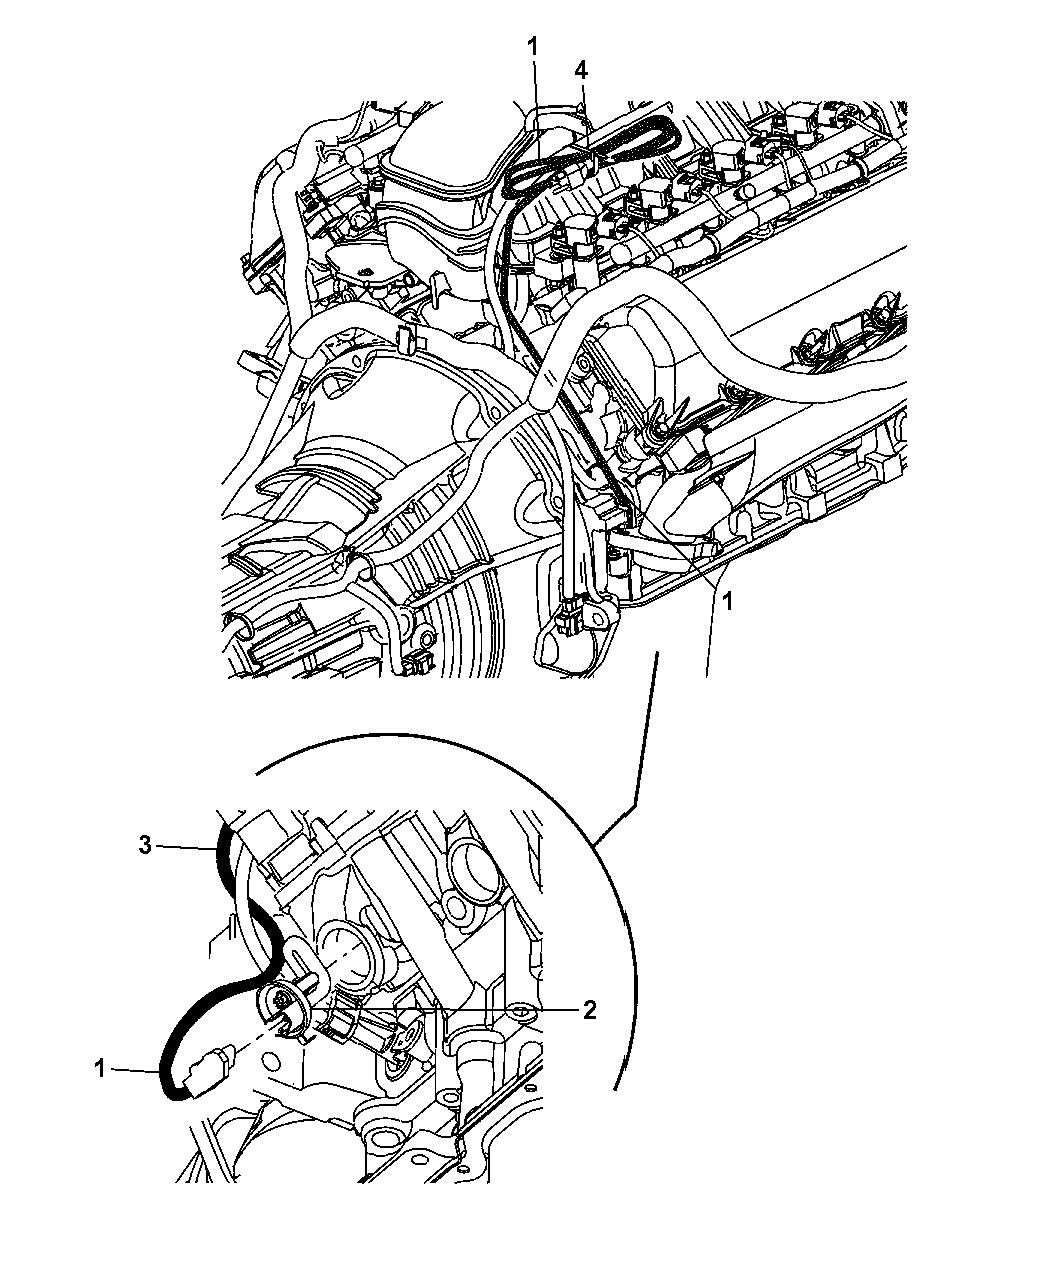 2008 Jeep Liberty Engine Cylinder Block Heater Jeep Liberty Engine Diagram on